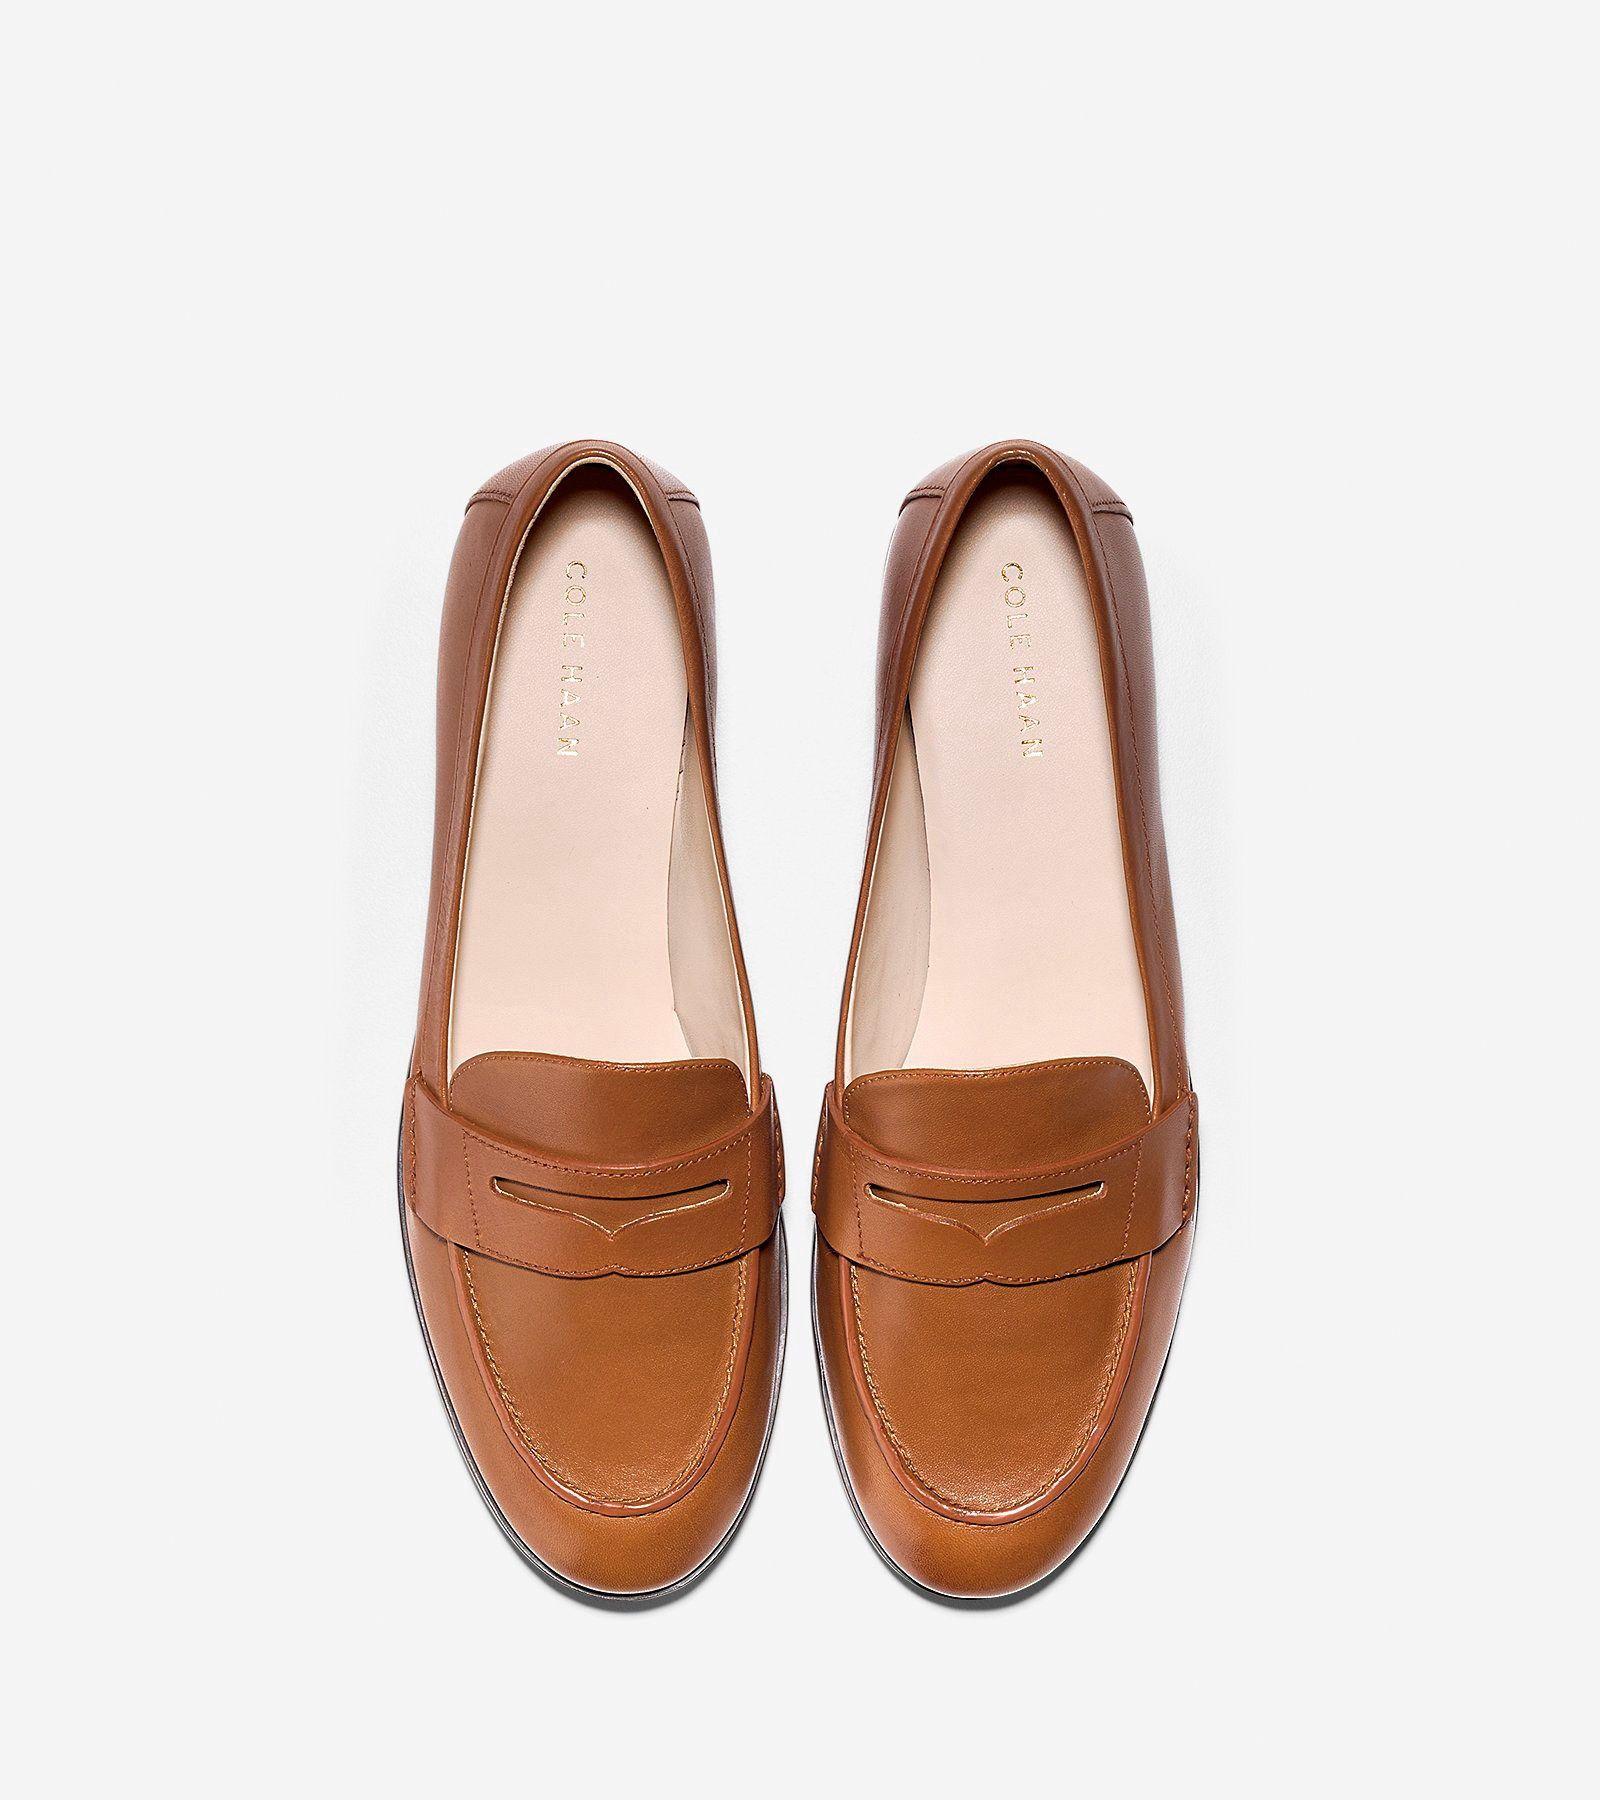 06fea2ed760 Cole Haan Women's Pinch Grand Penny Loafer - British Tan 8 B Medium ...